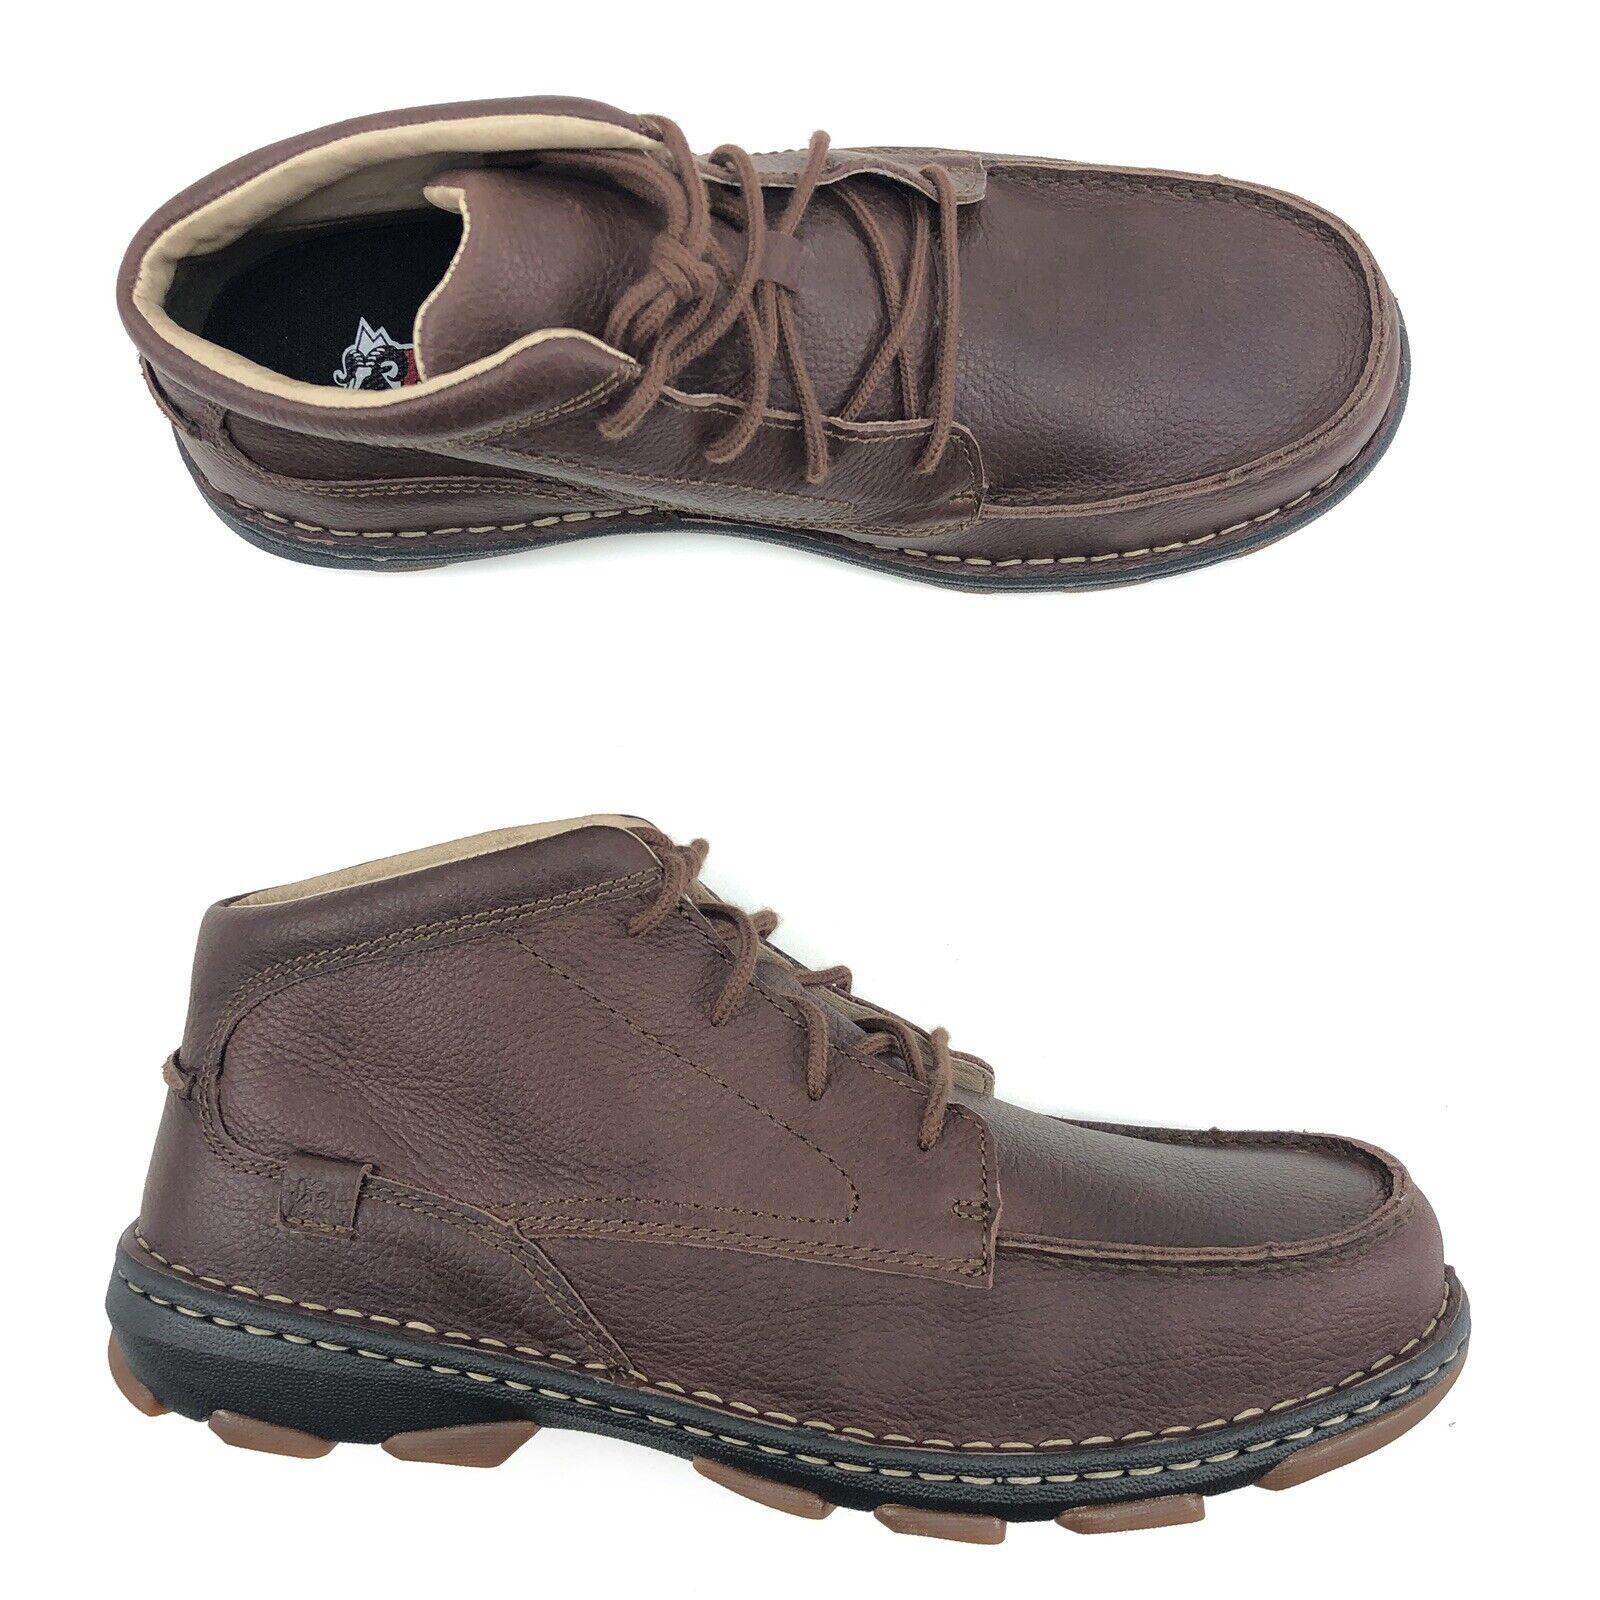 Rocky Boots Cruiser Casual Chukka Brown Full Grain Leather Men Size 10